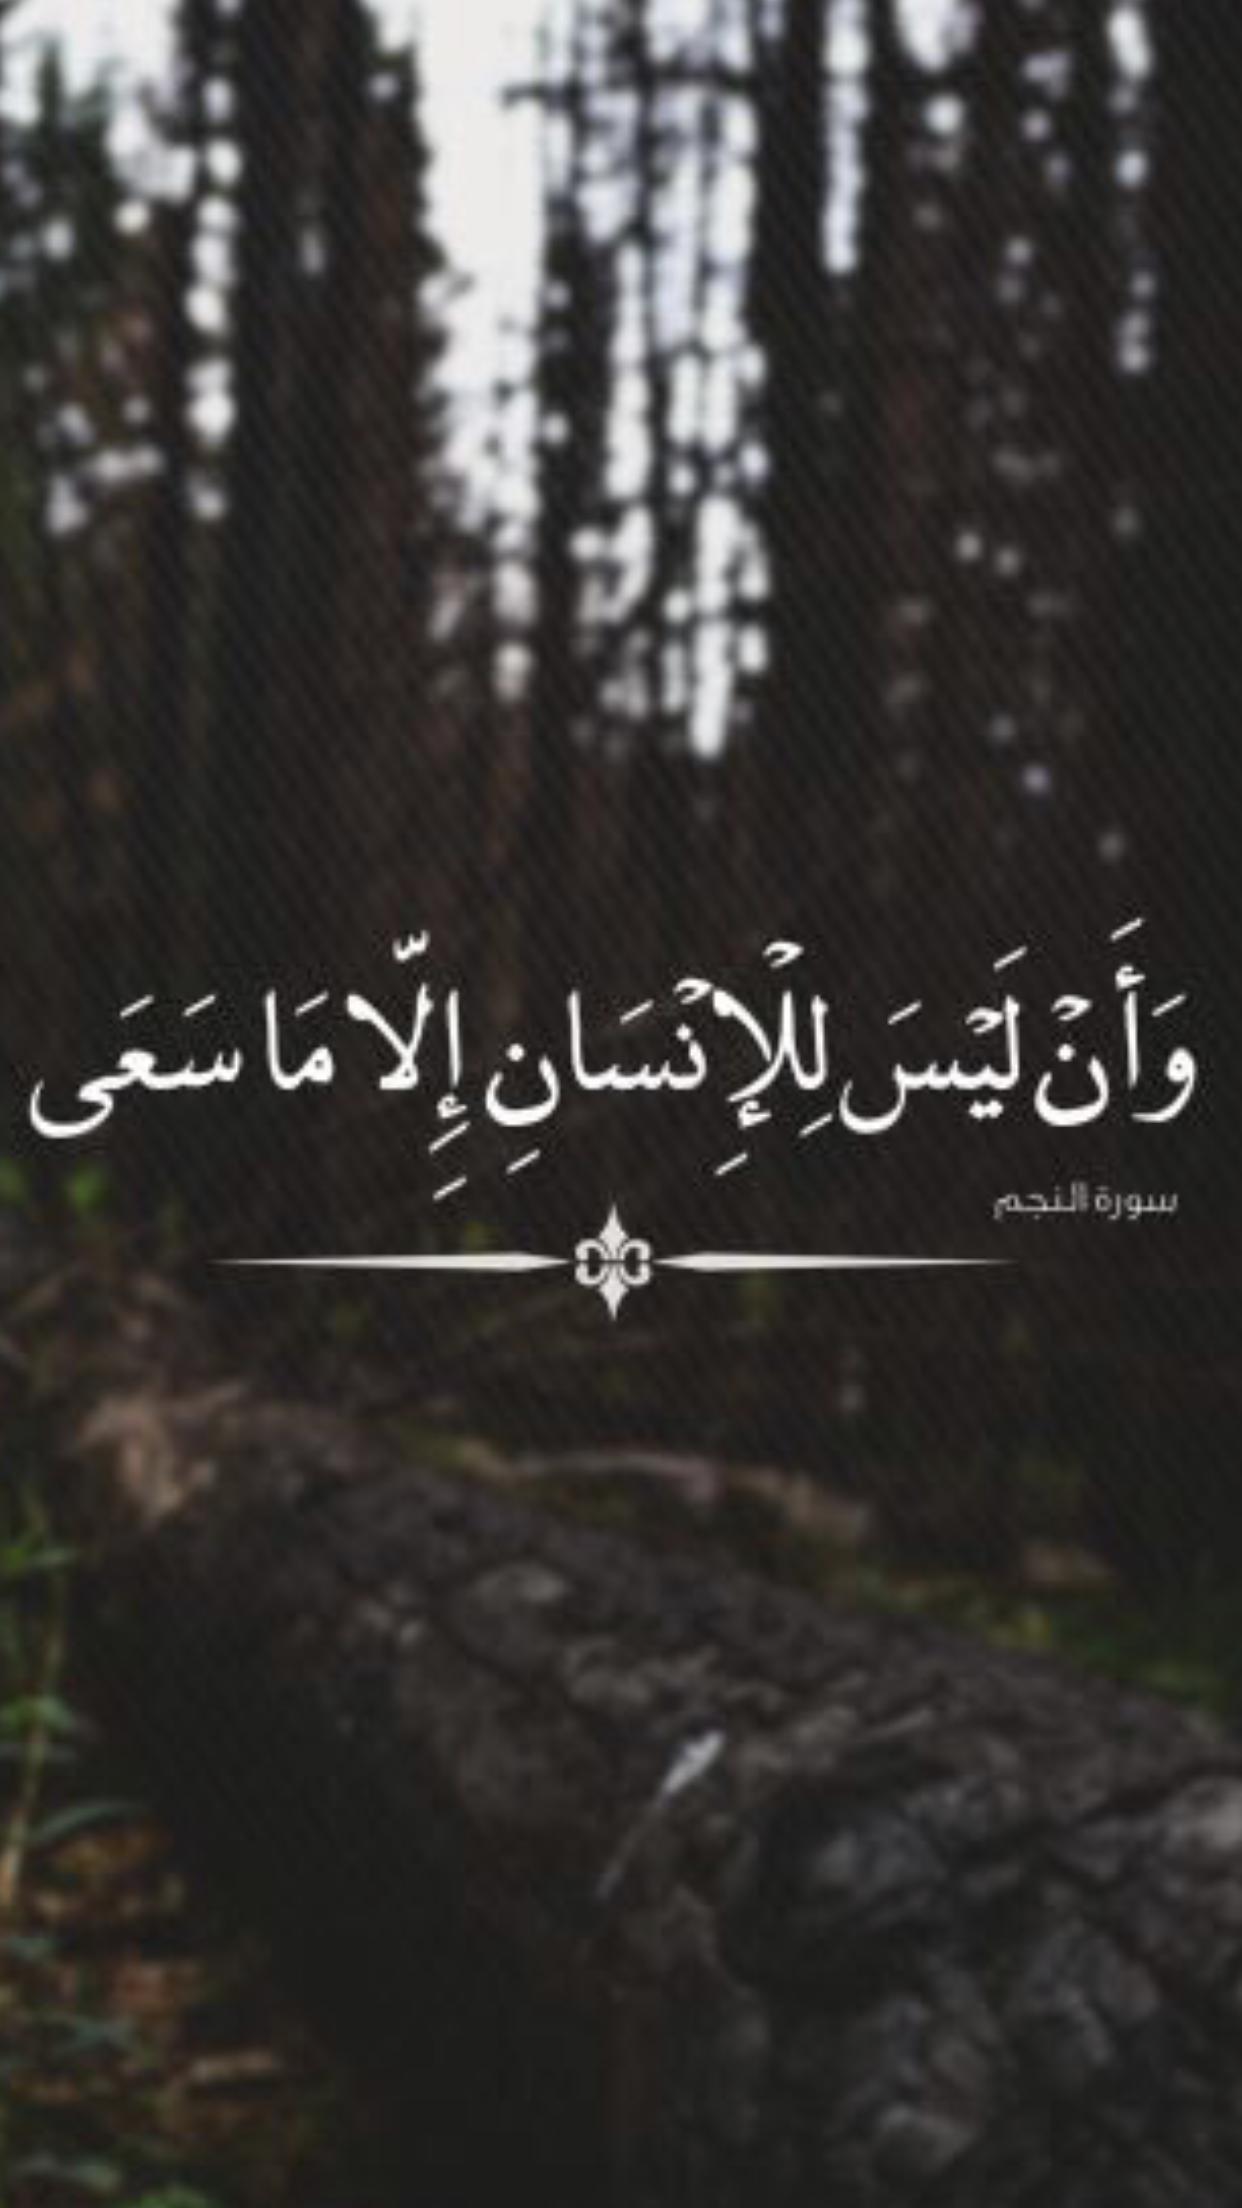 Pin By Kawther Almuallem On ايجابي متفائل تفائل تفاؤل ايجابية ايجابيات فرح سرور متعه وناسه تطوير ذات نجاح حب احبك كلمات امل Quran Quotes Beautiful Quran Quotes Quran Quotes Verses